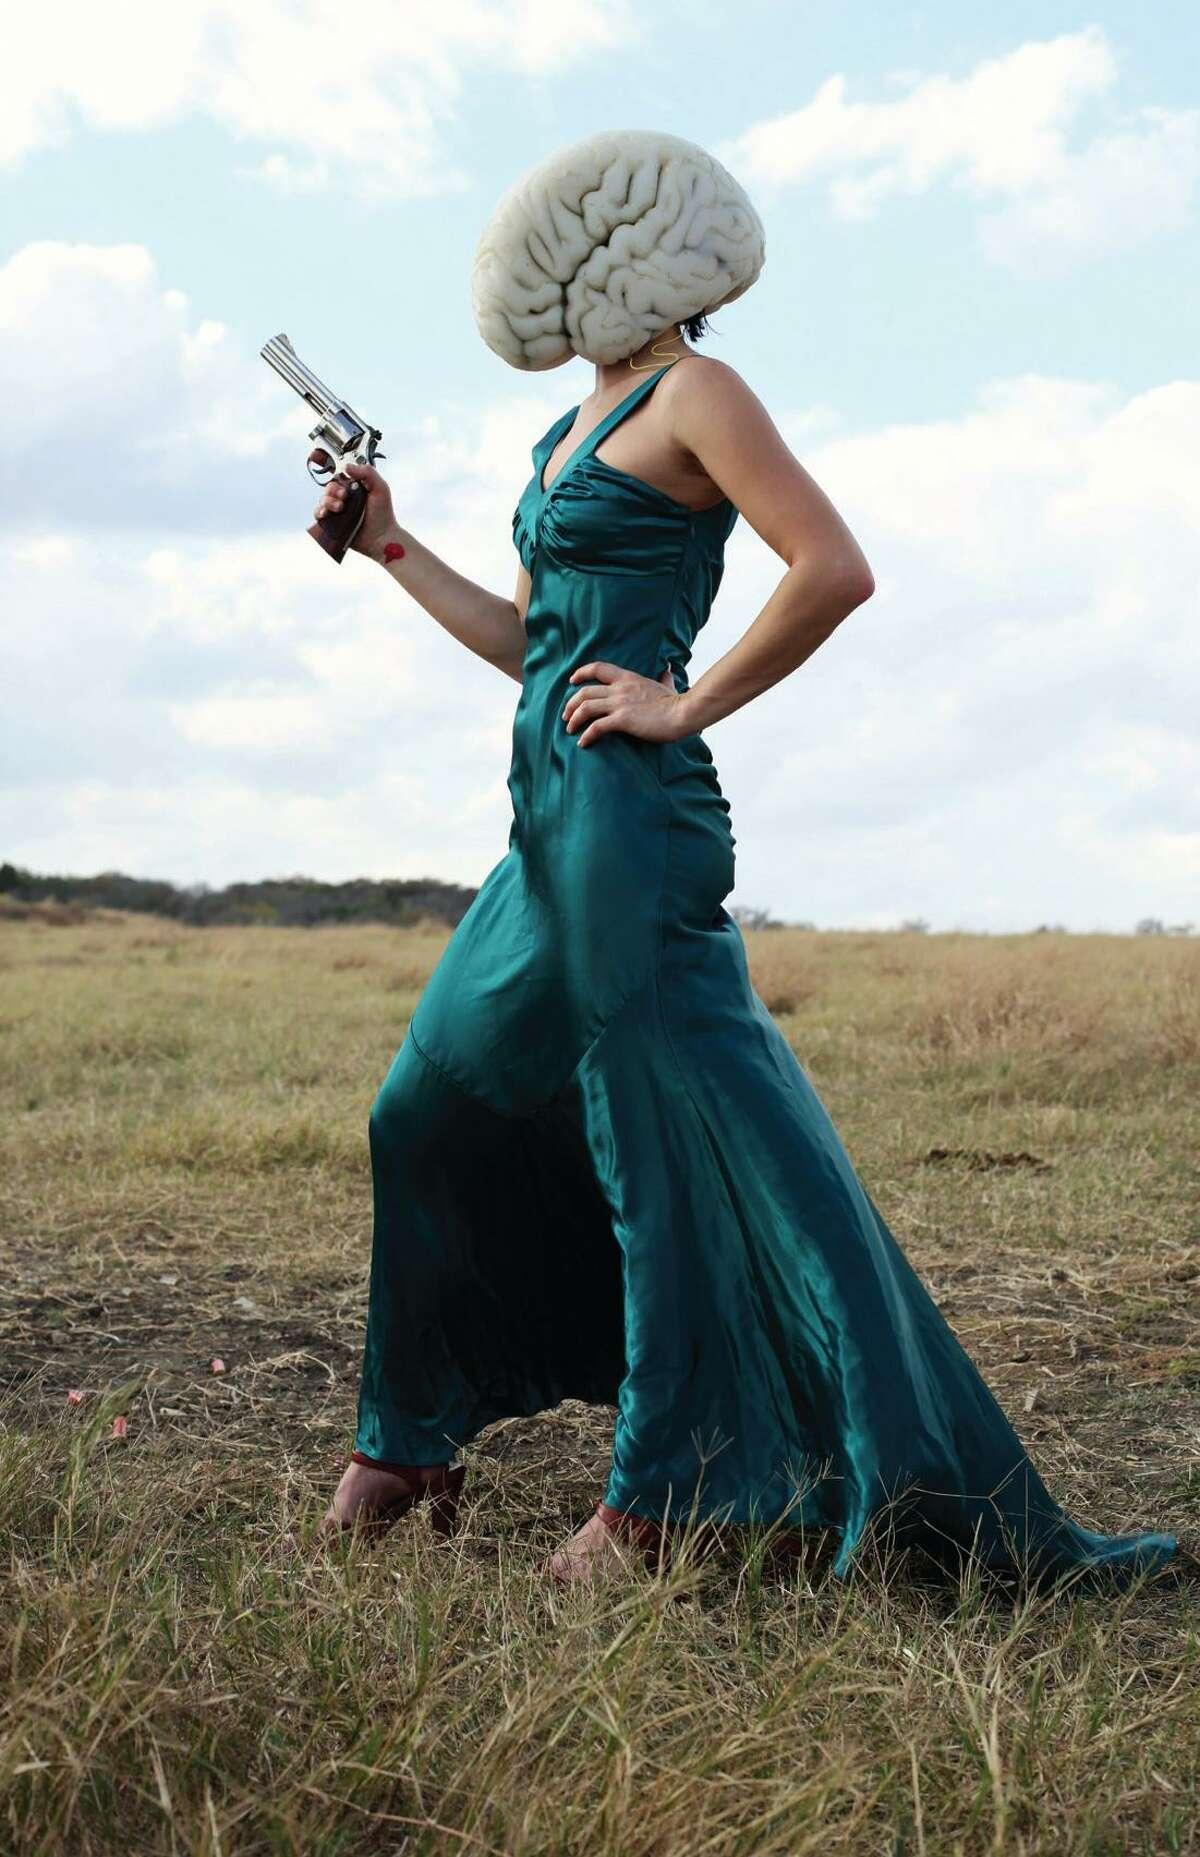 The Devil Girl, a member of the Estonian performance art group Non Grata.